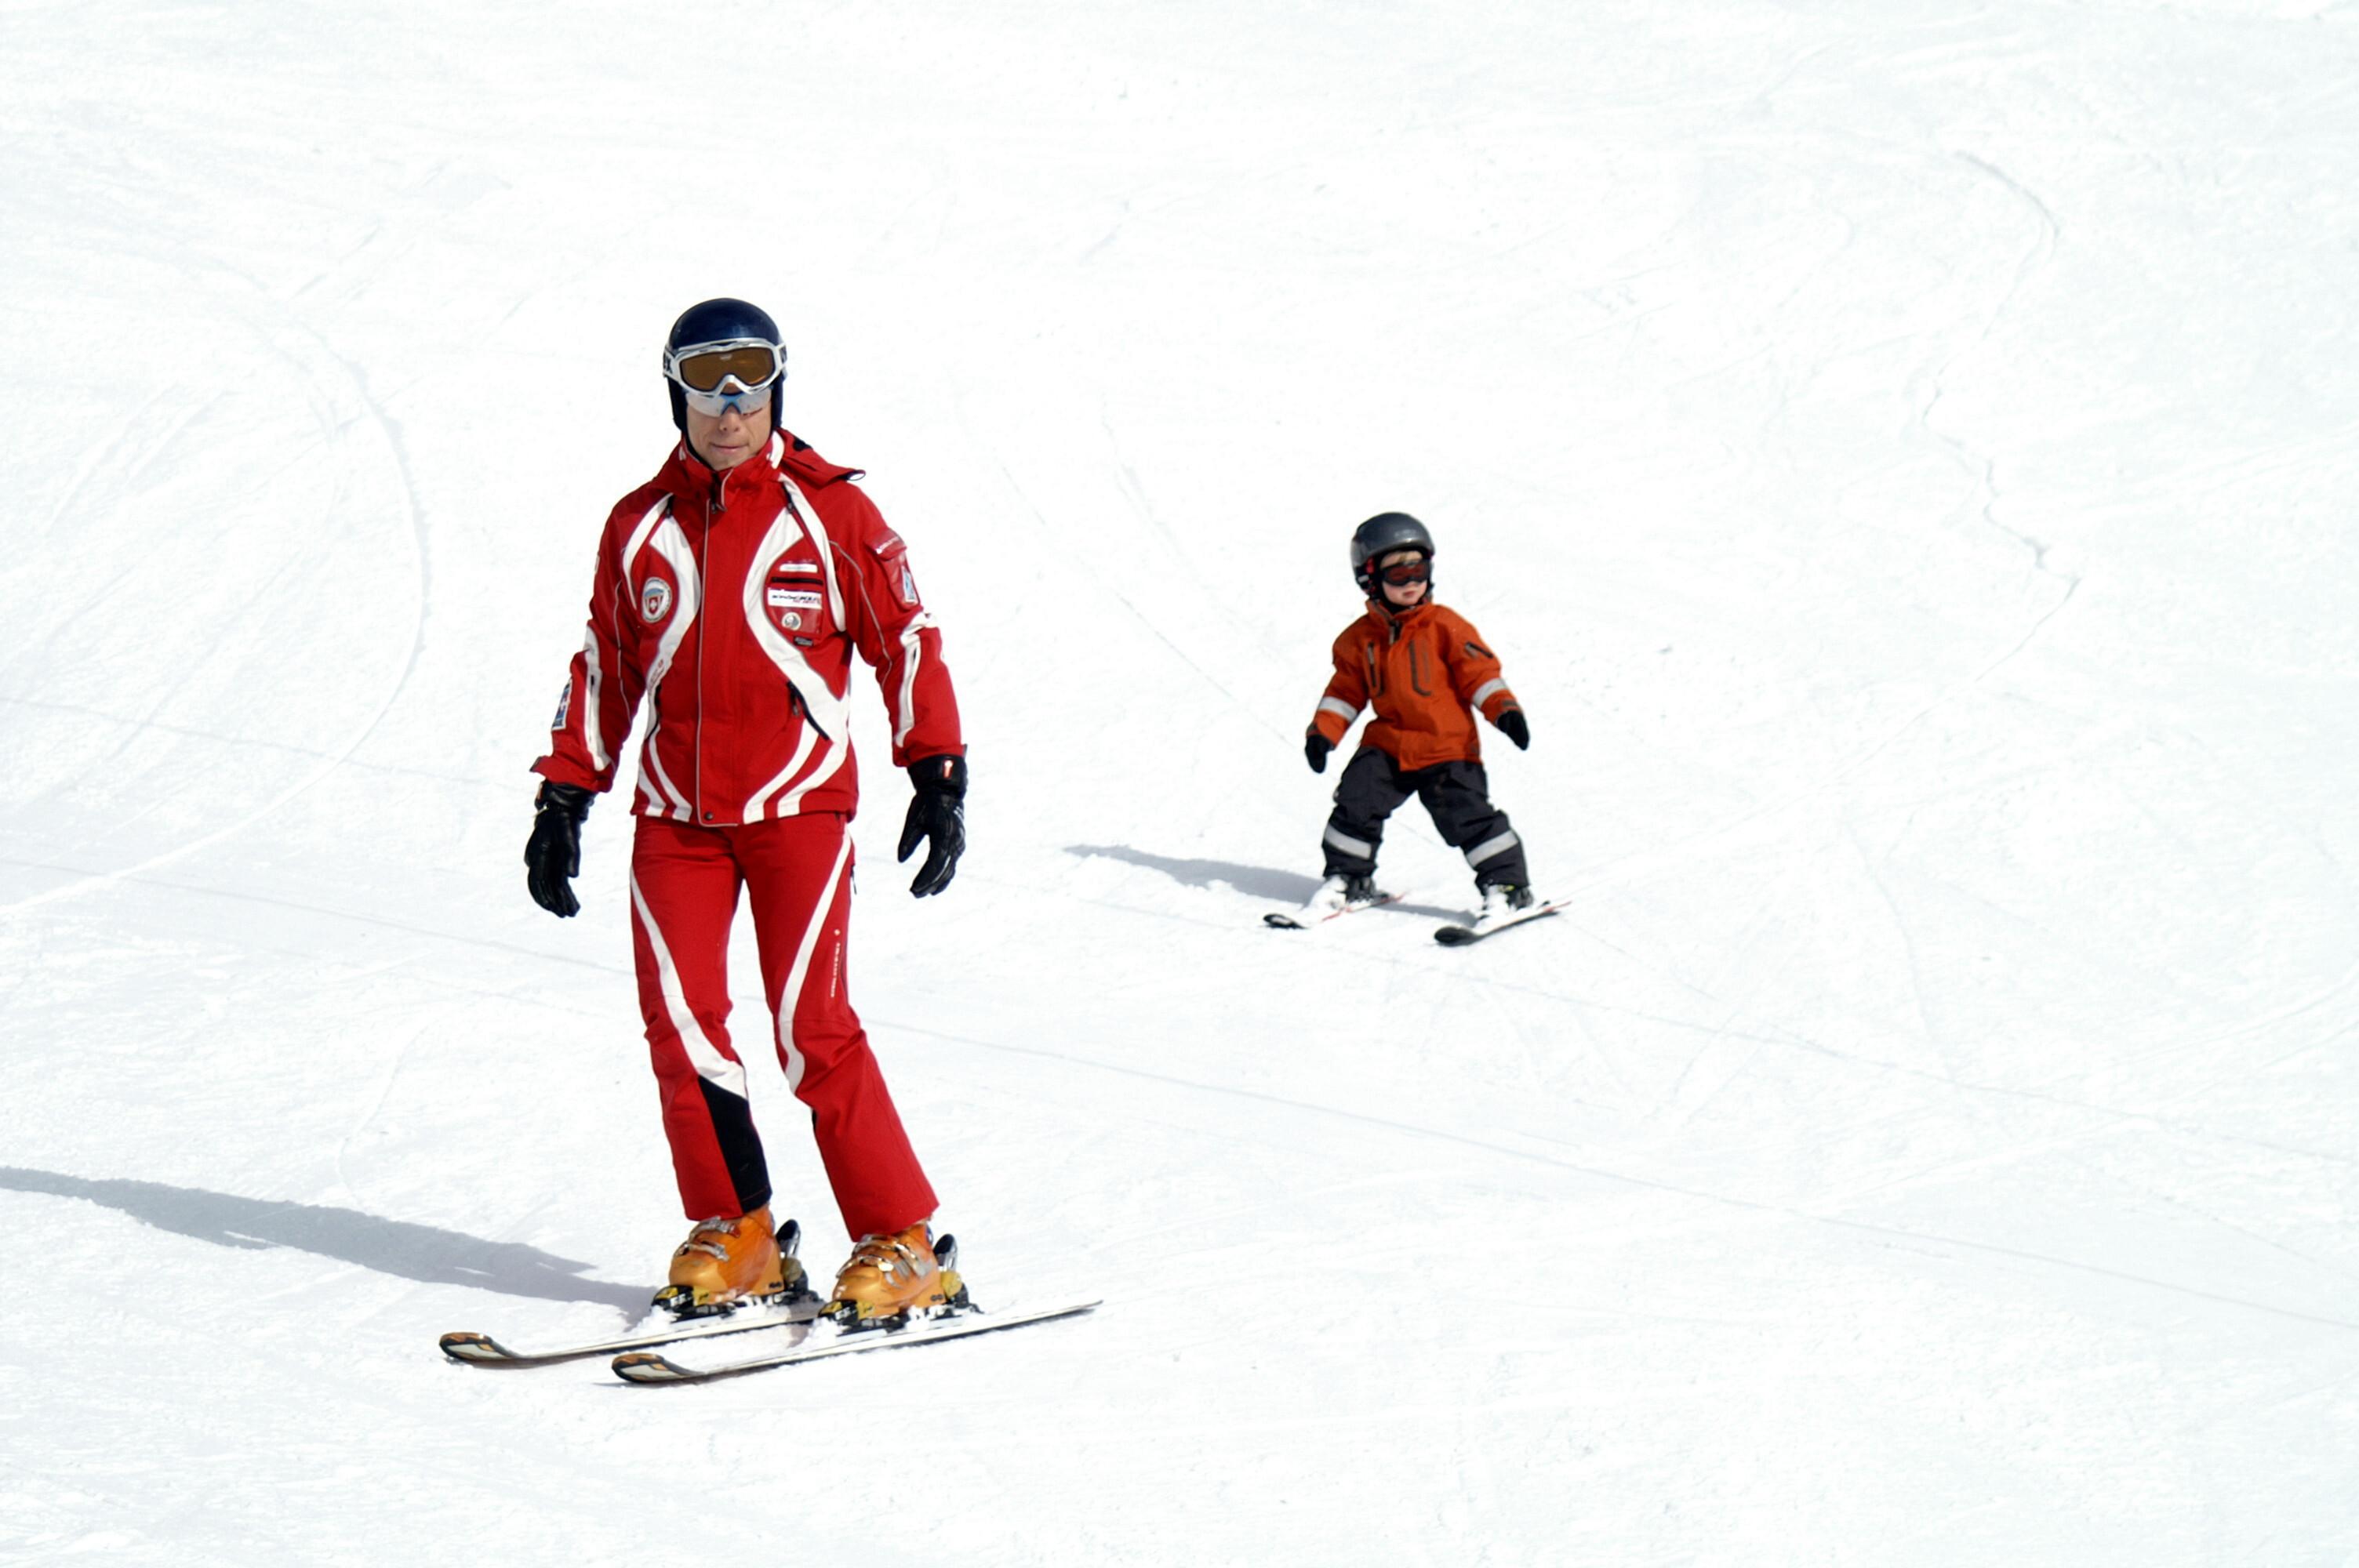 Skischule Bär Snowsports Engadin Slide 2